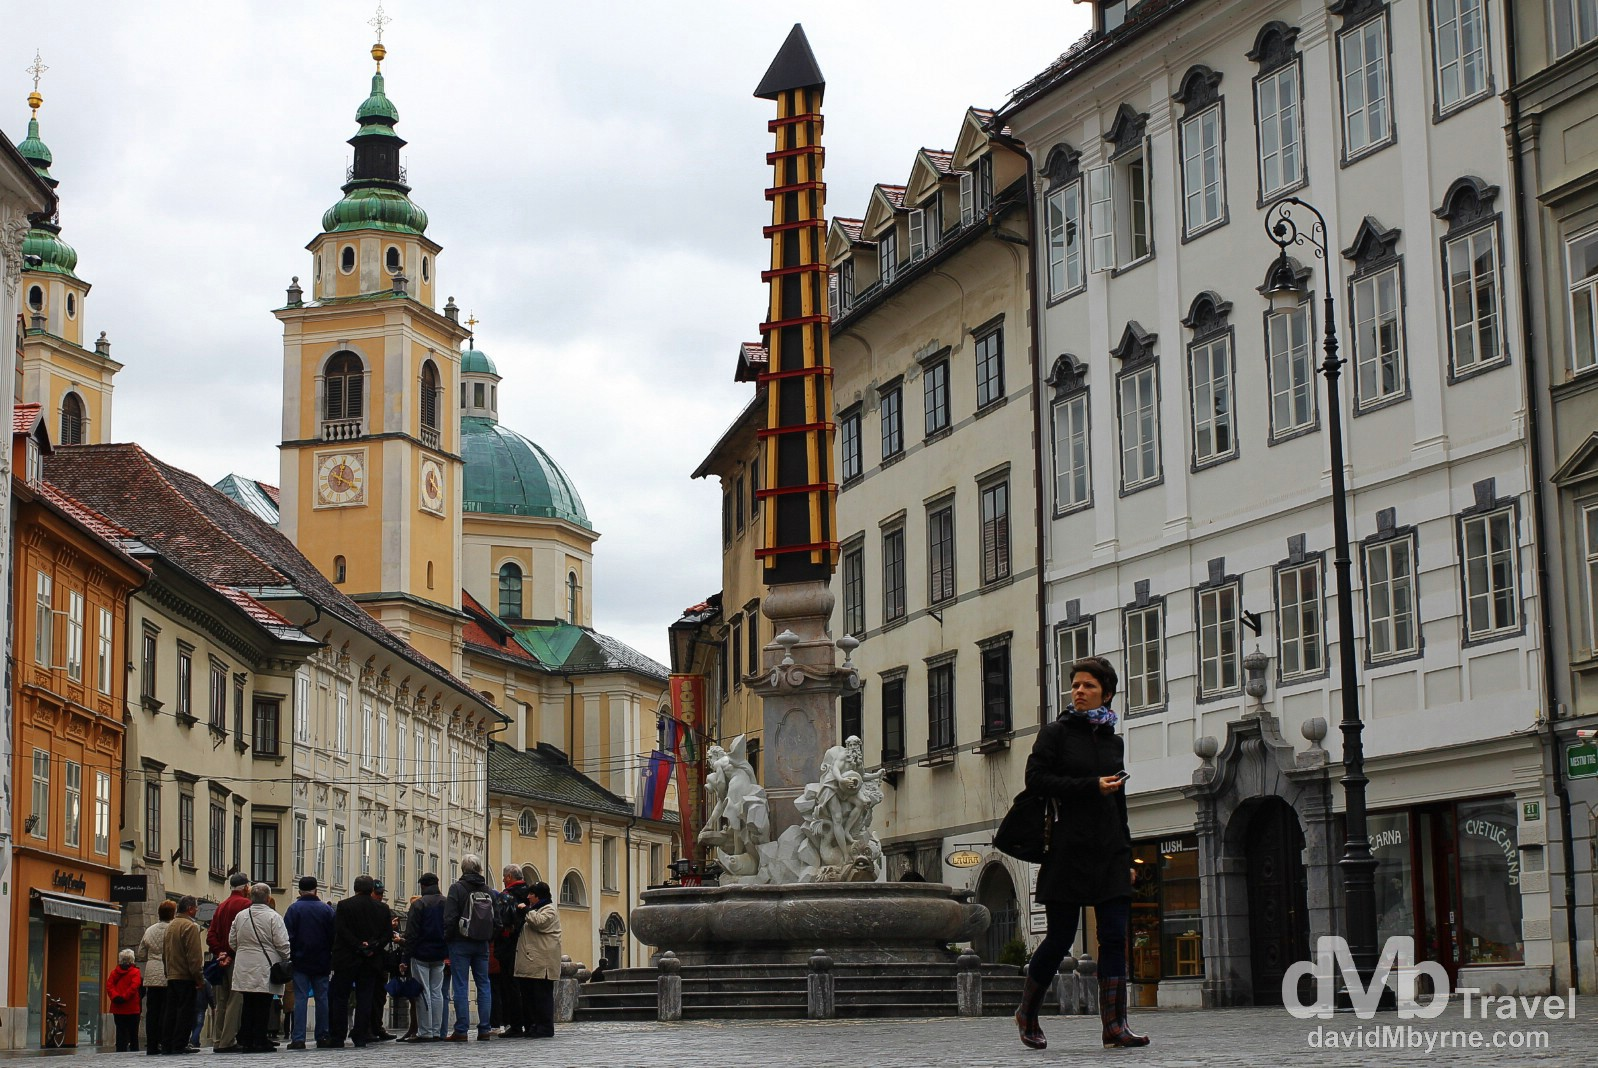 Mestni trg in the medieval Old Town part of Ljubljana, Slovenia. March 23rd, 2014.